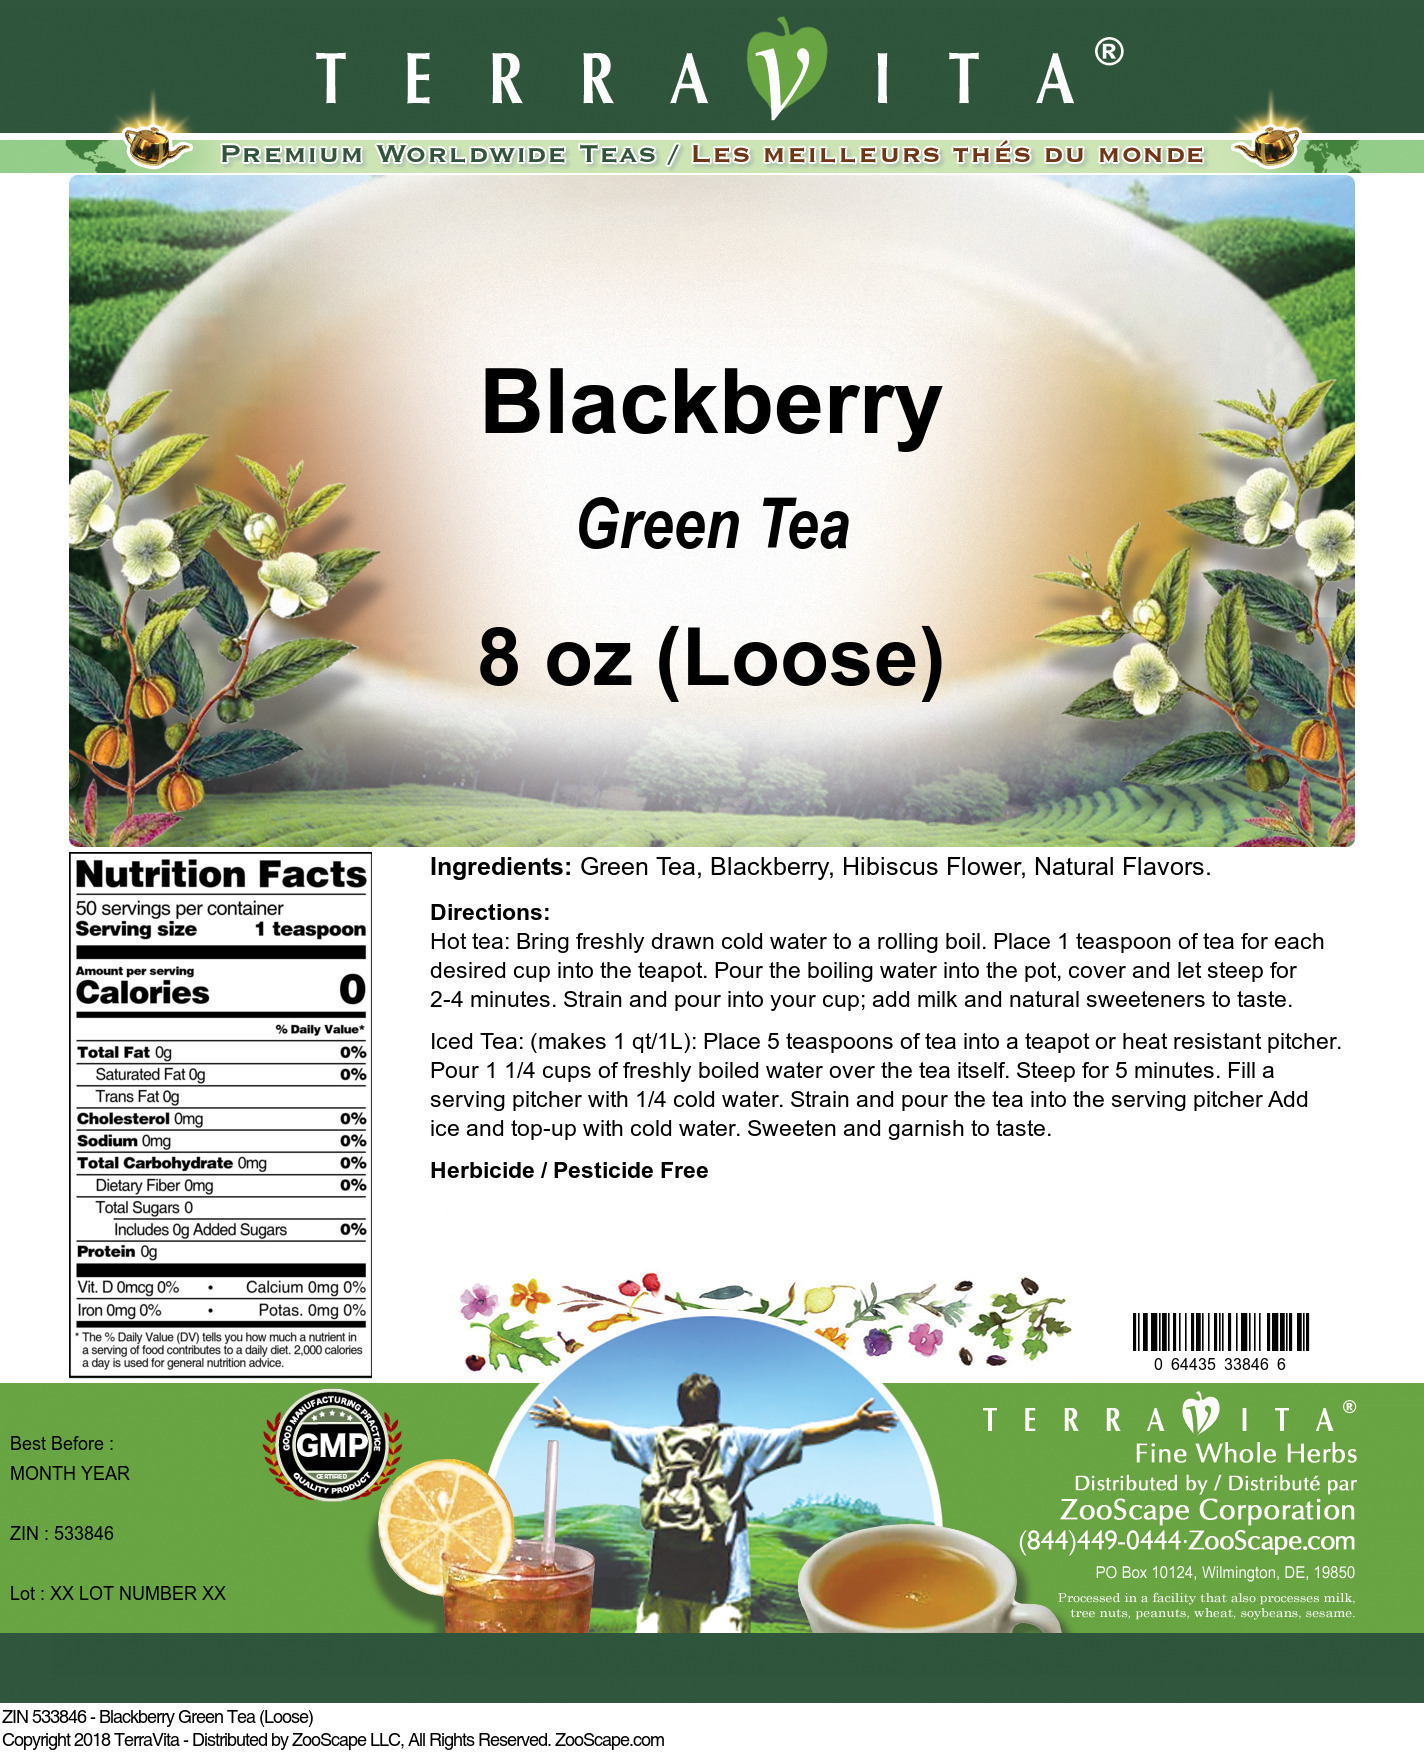 Blackberry Green Tea (Loose)